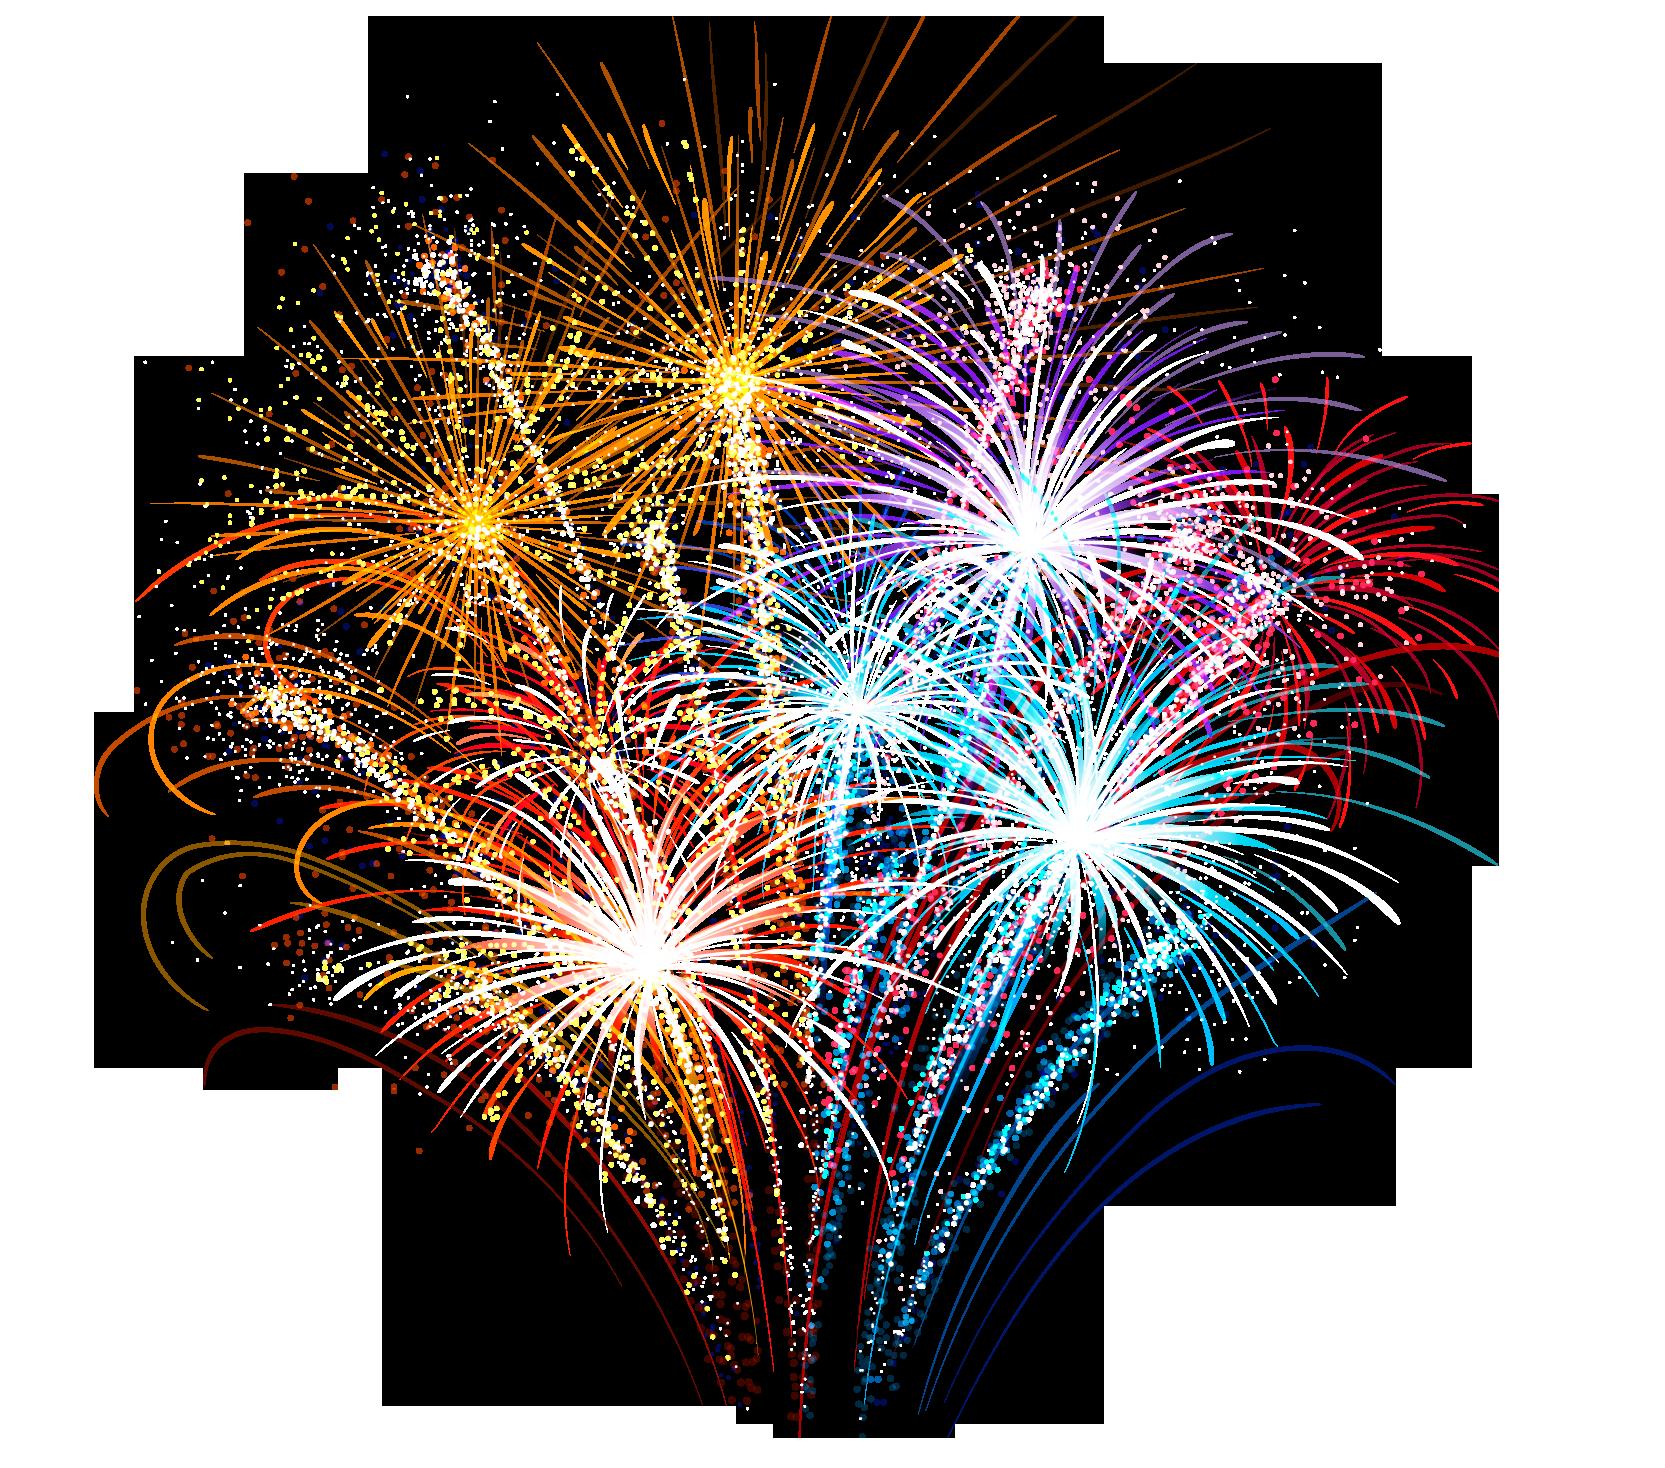 fireworks - Sticker by Blade AKS